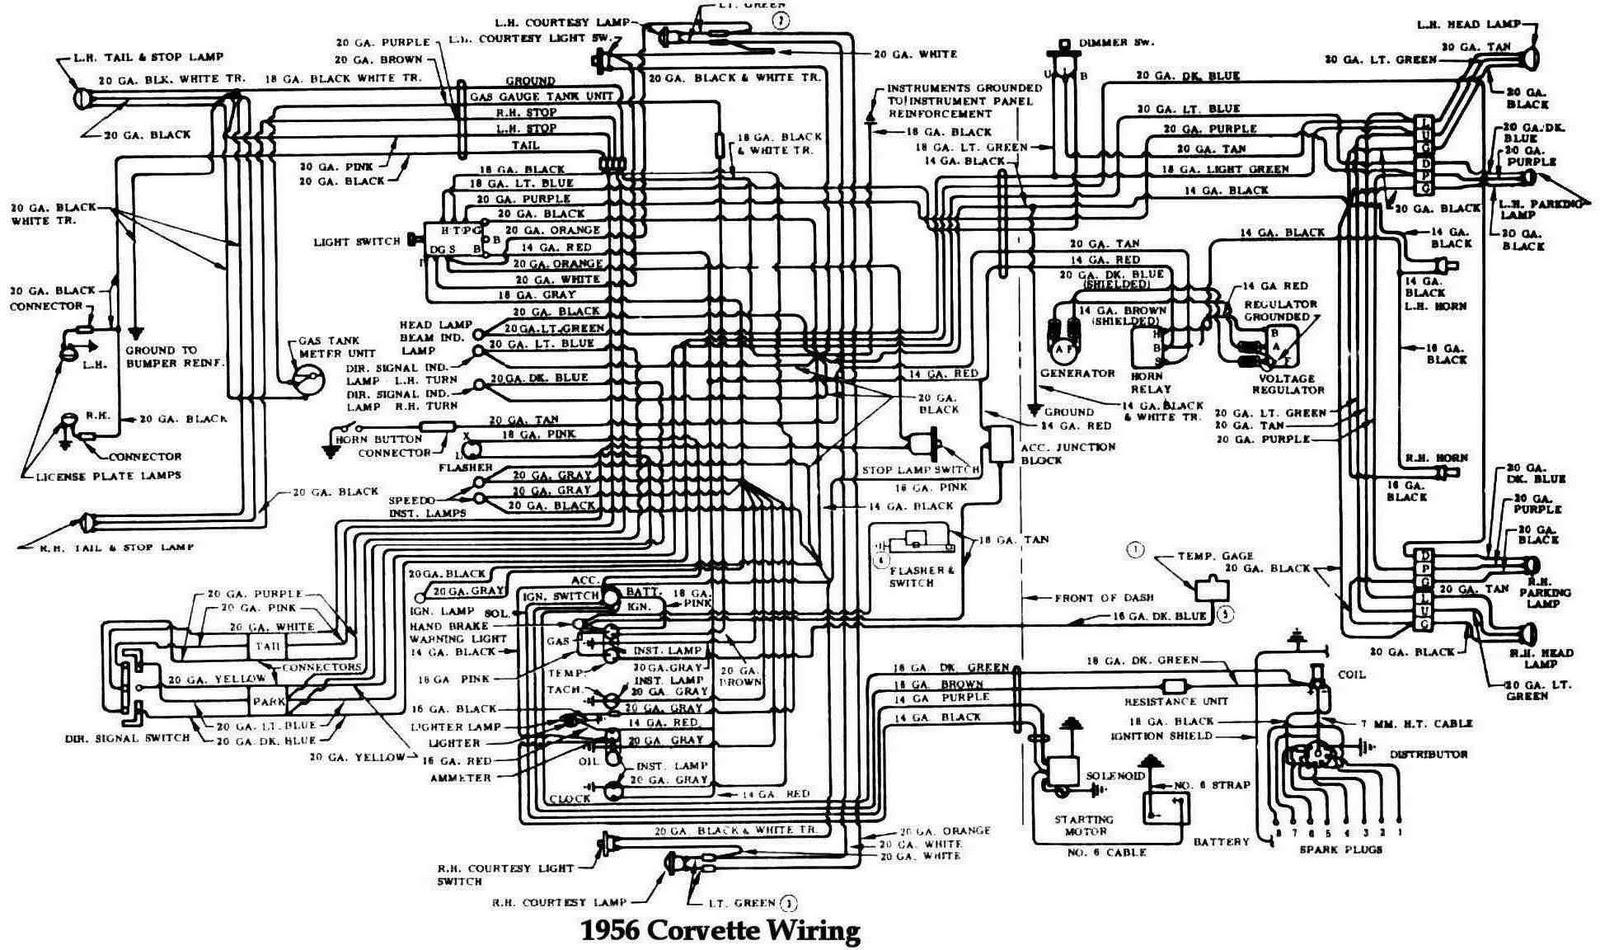 vauxhall combo wiring diagram download wiring diagram update corsa c speedo fuse location vauxhall corsa d wiring diagram pdf